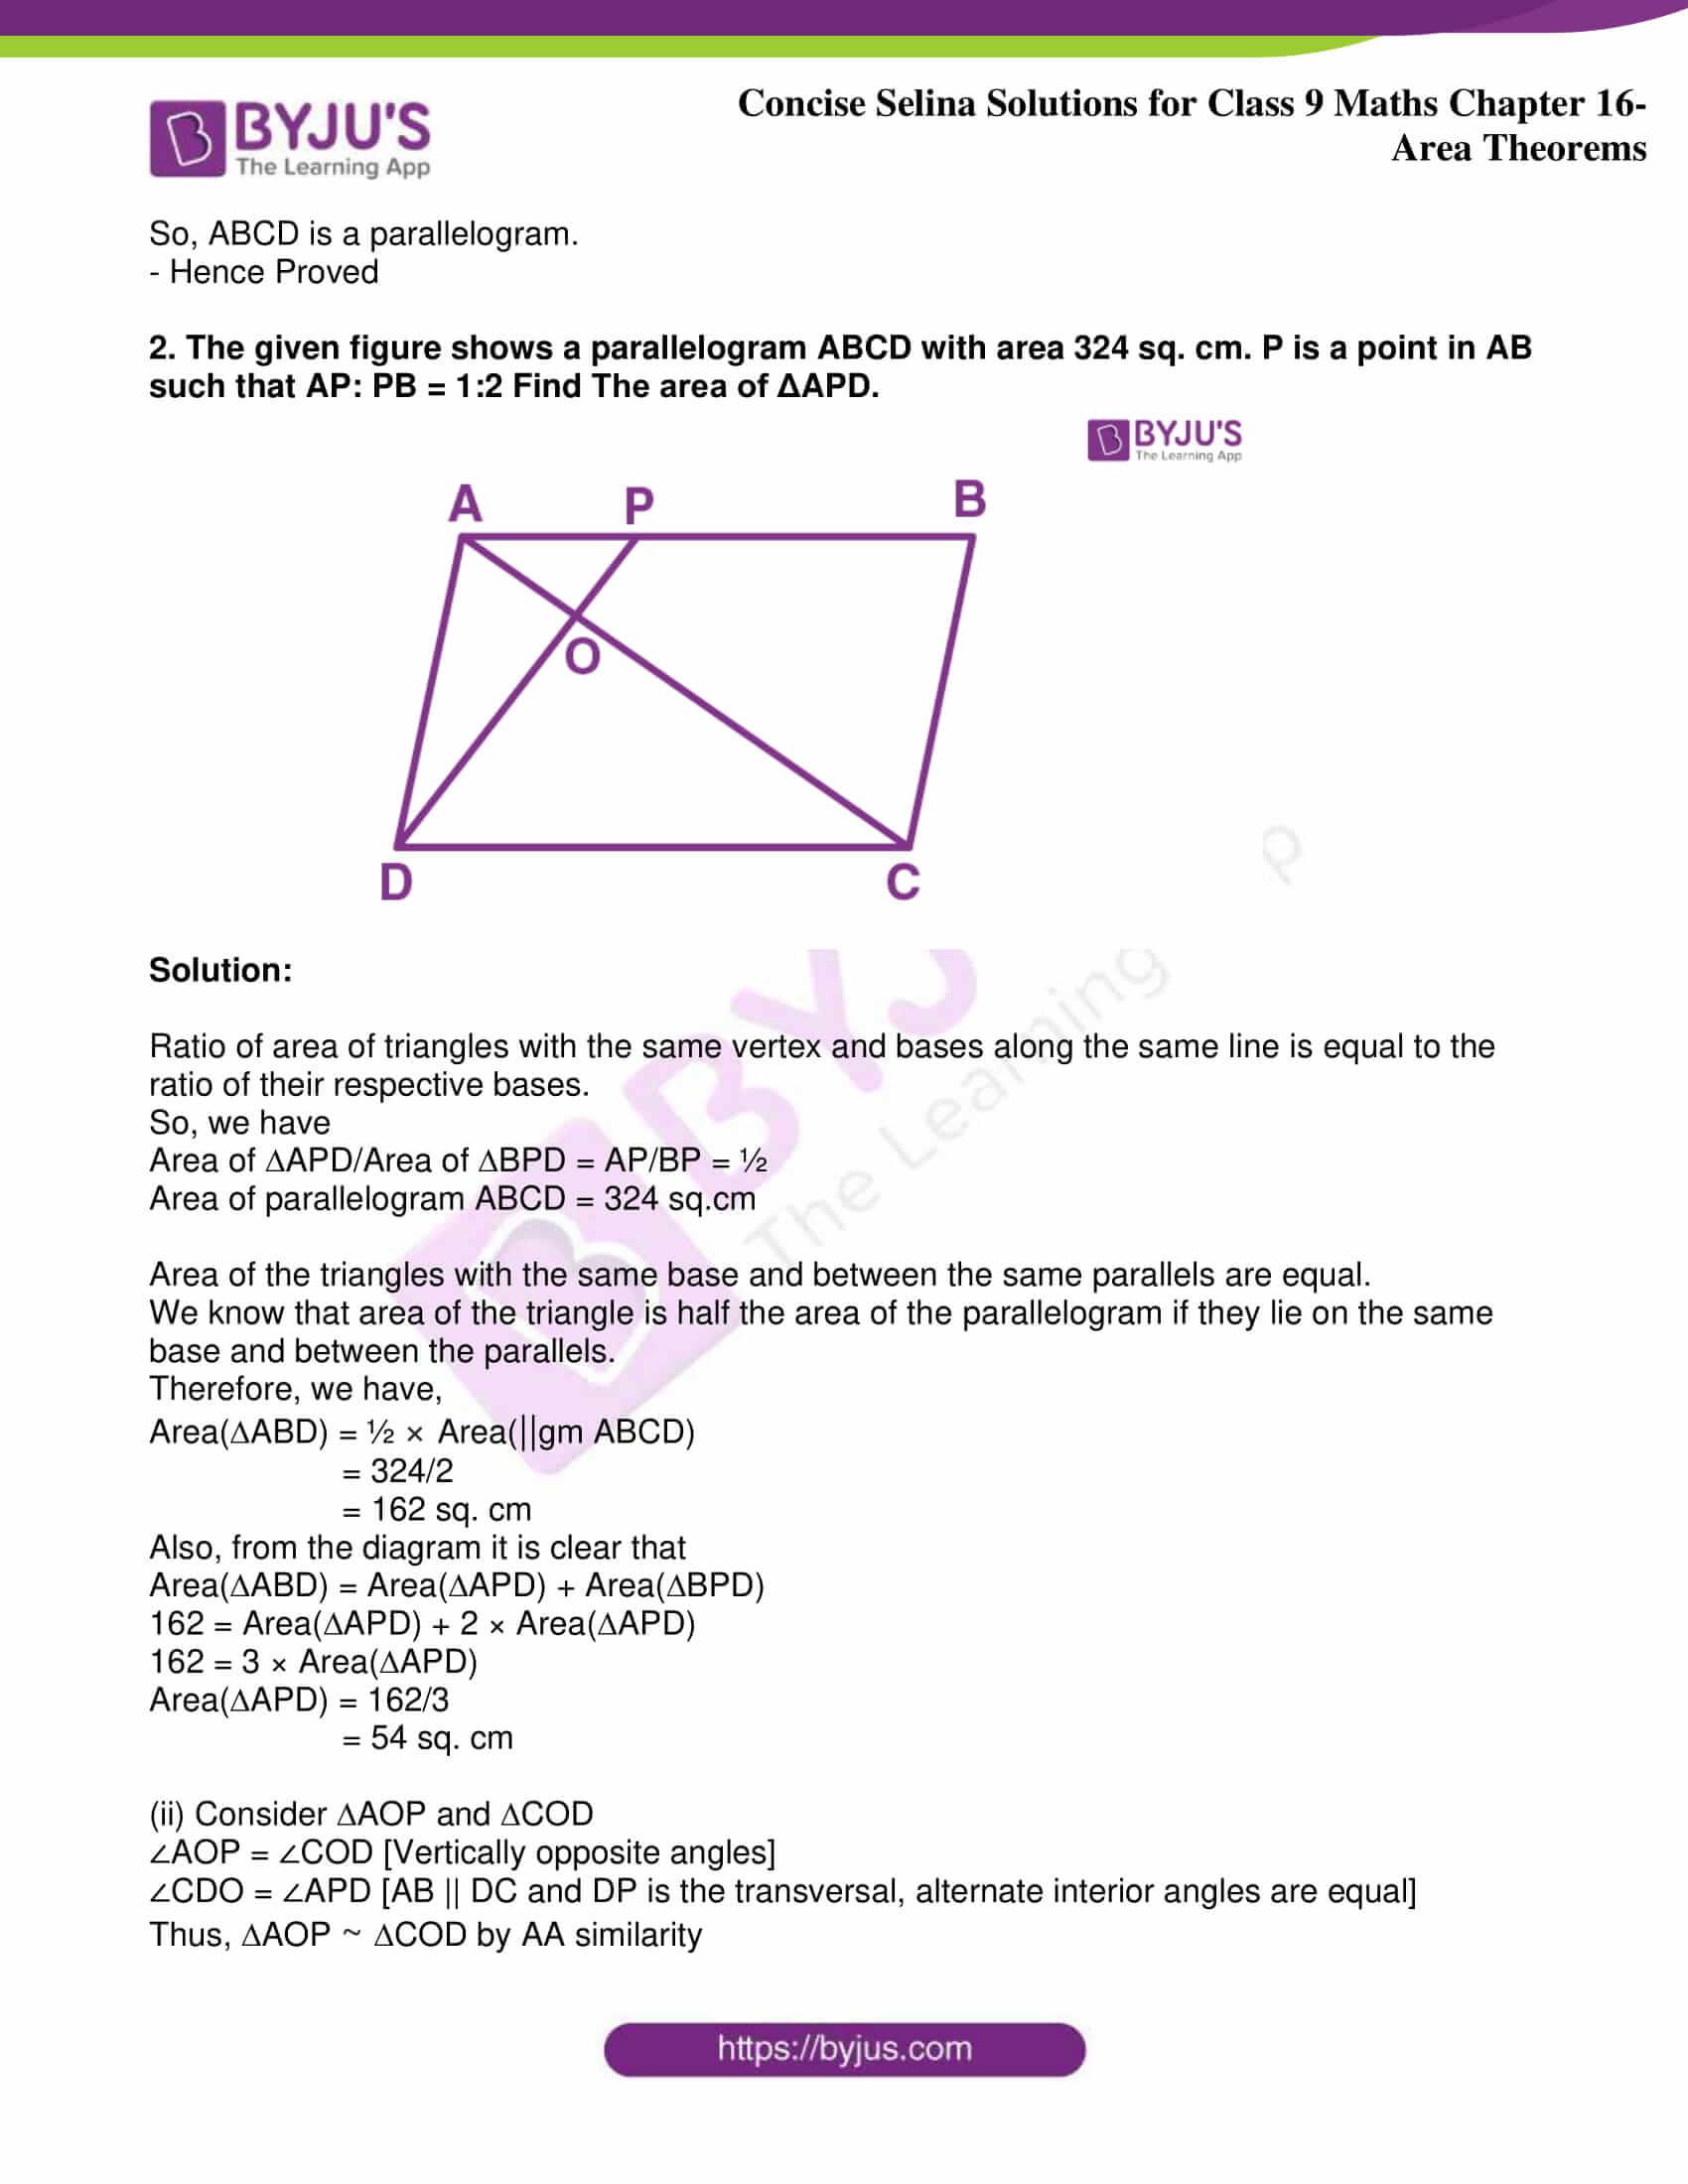 icse class 9 jun9 maths selina solutions chapter 16 area theorems 26